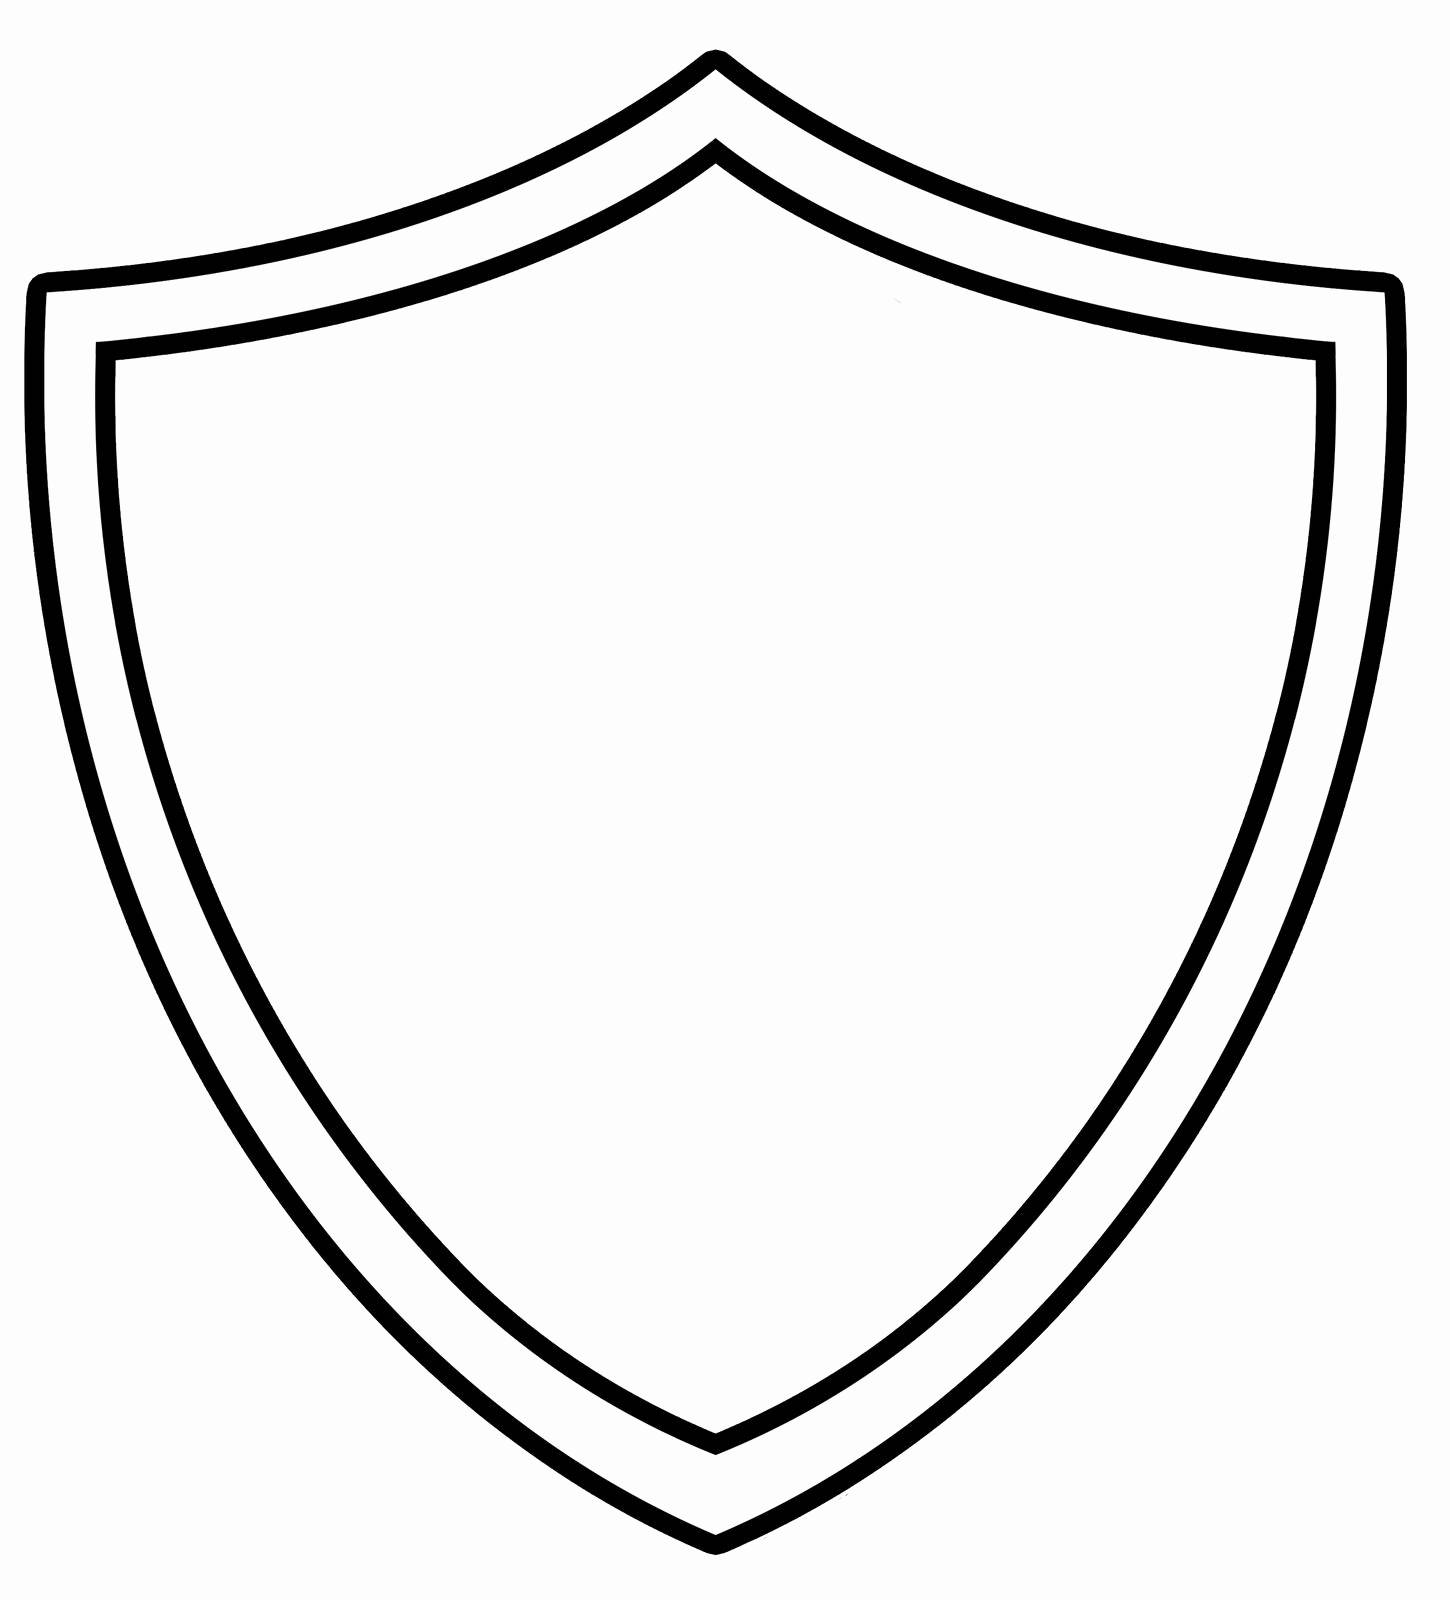 Shield Template 288 Clip Art at Clker. vector clip art online